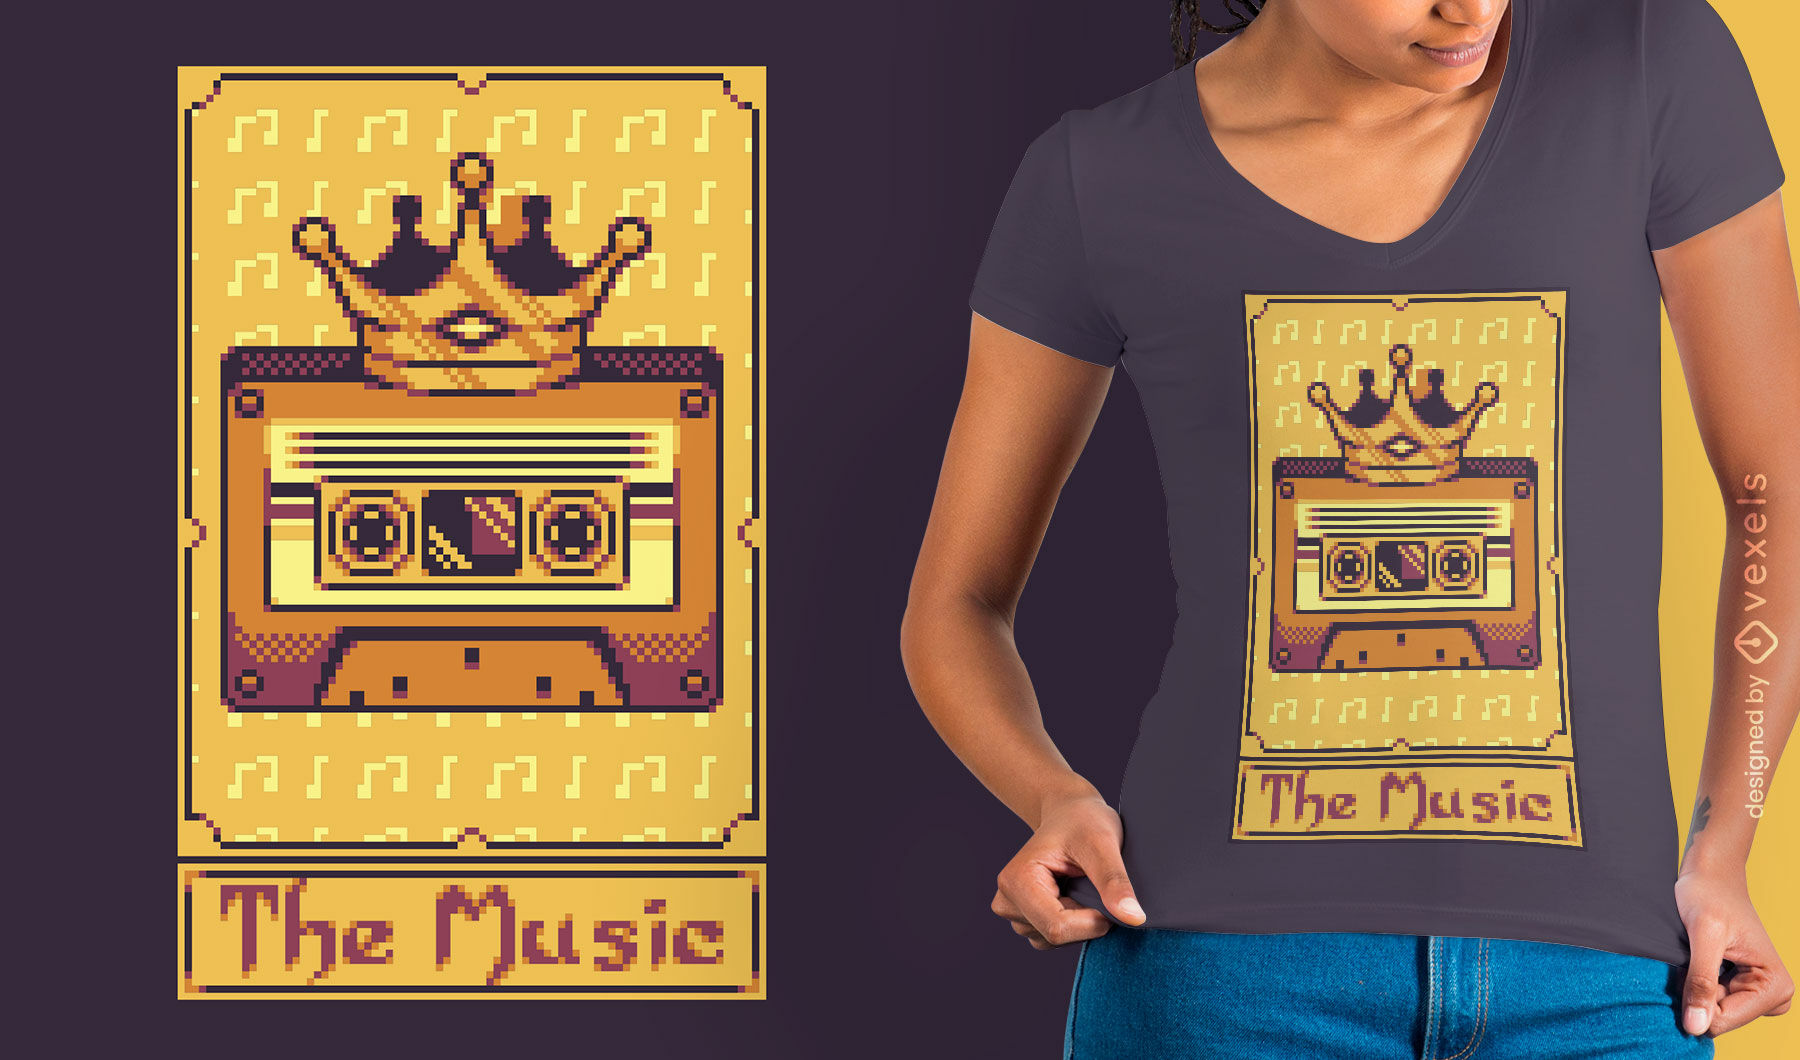 Dise?o de camiseta de cassette de m?sica de tarjeta de tarot de p?xeles